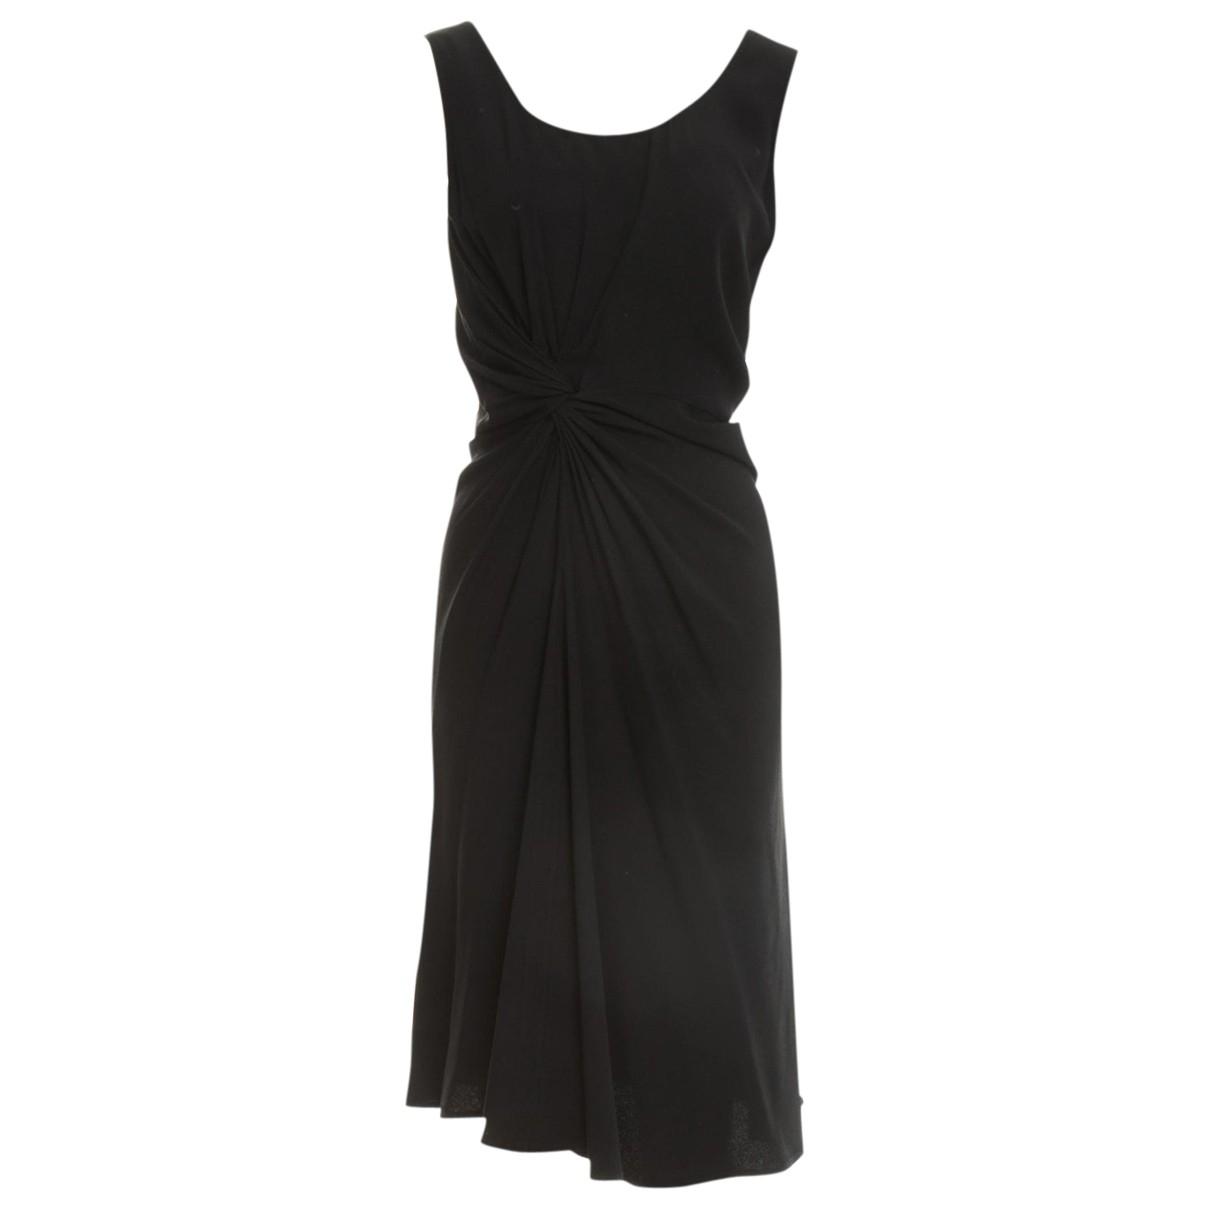 Dior \N Black dress for Women 36 FR